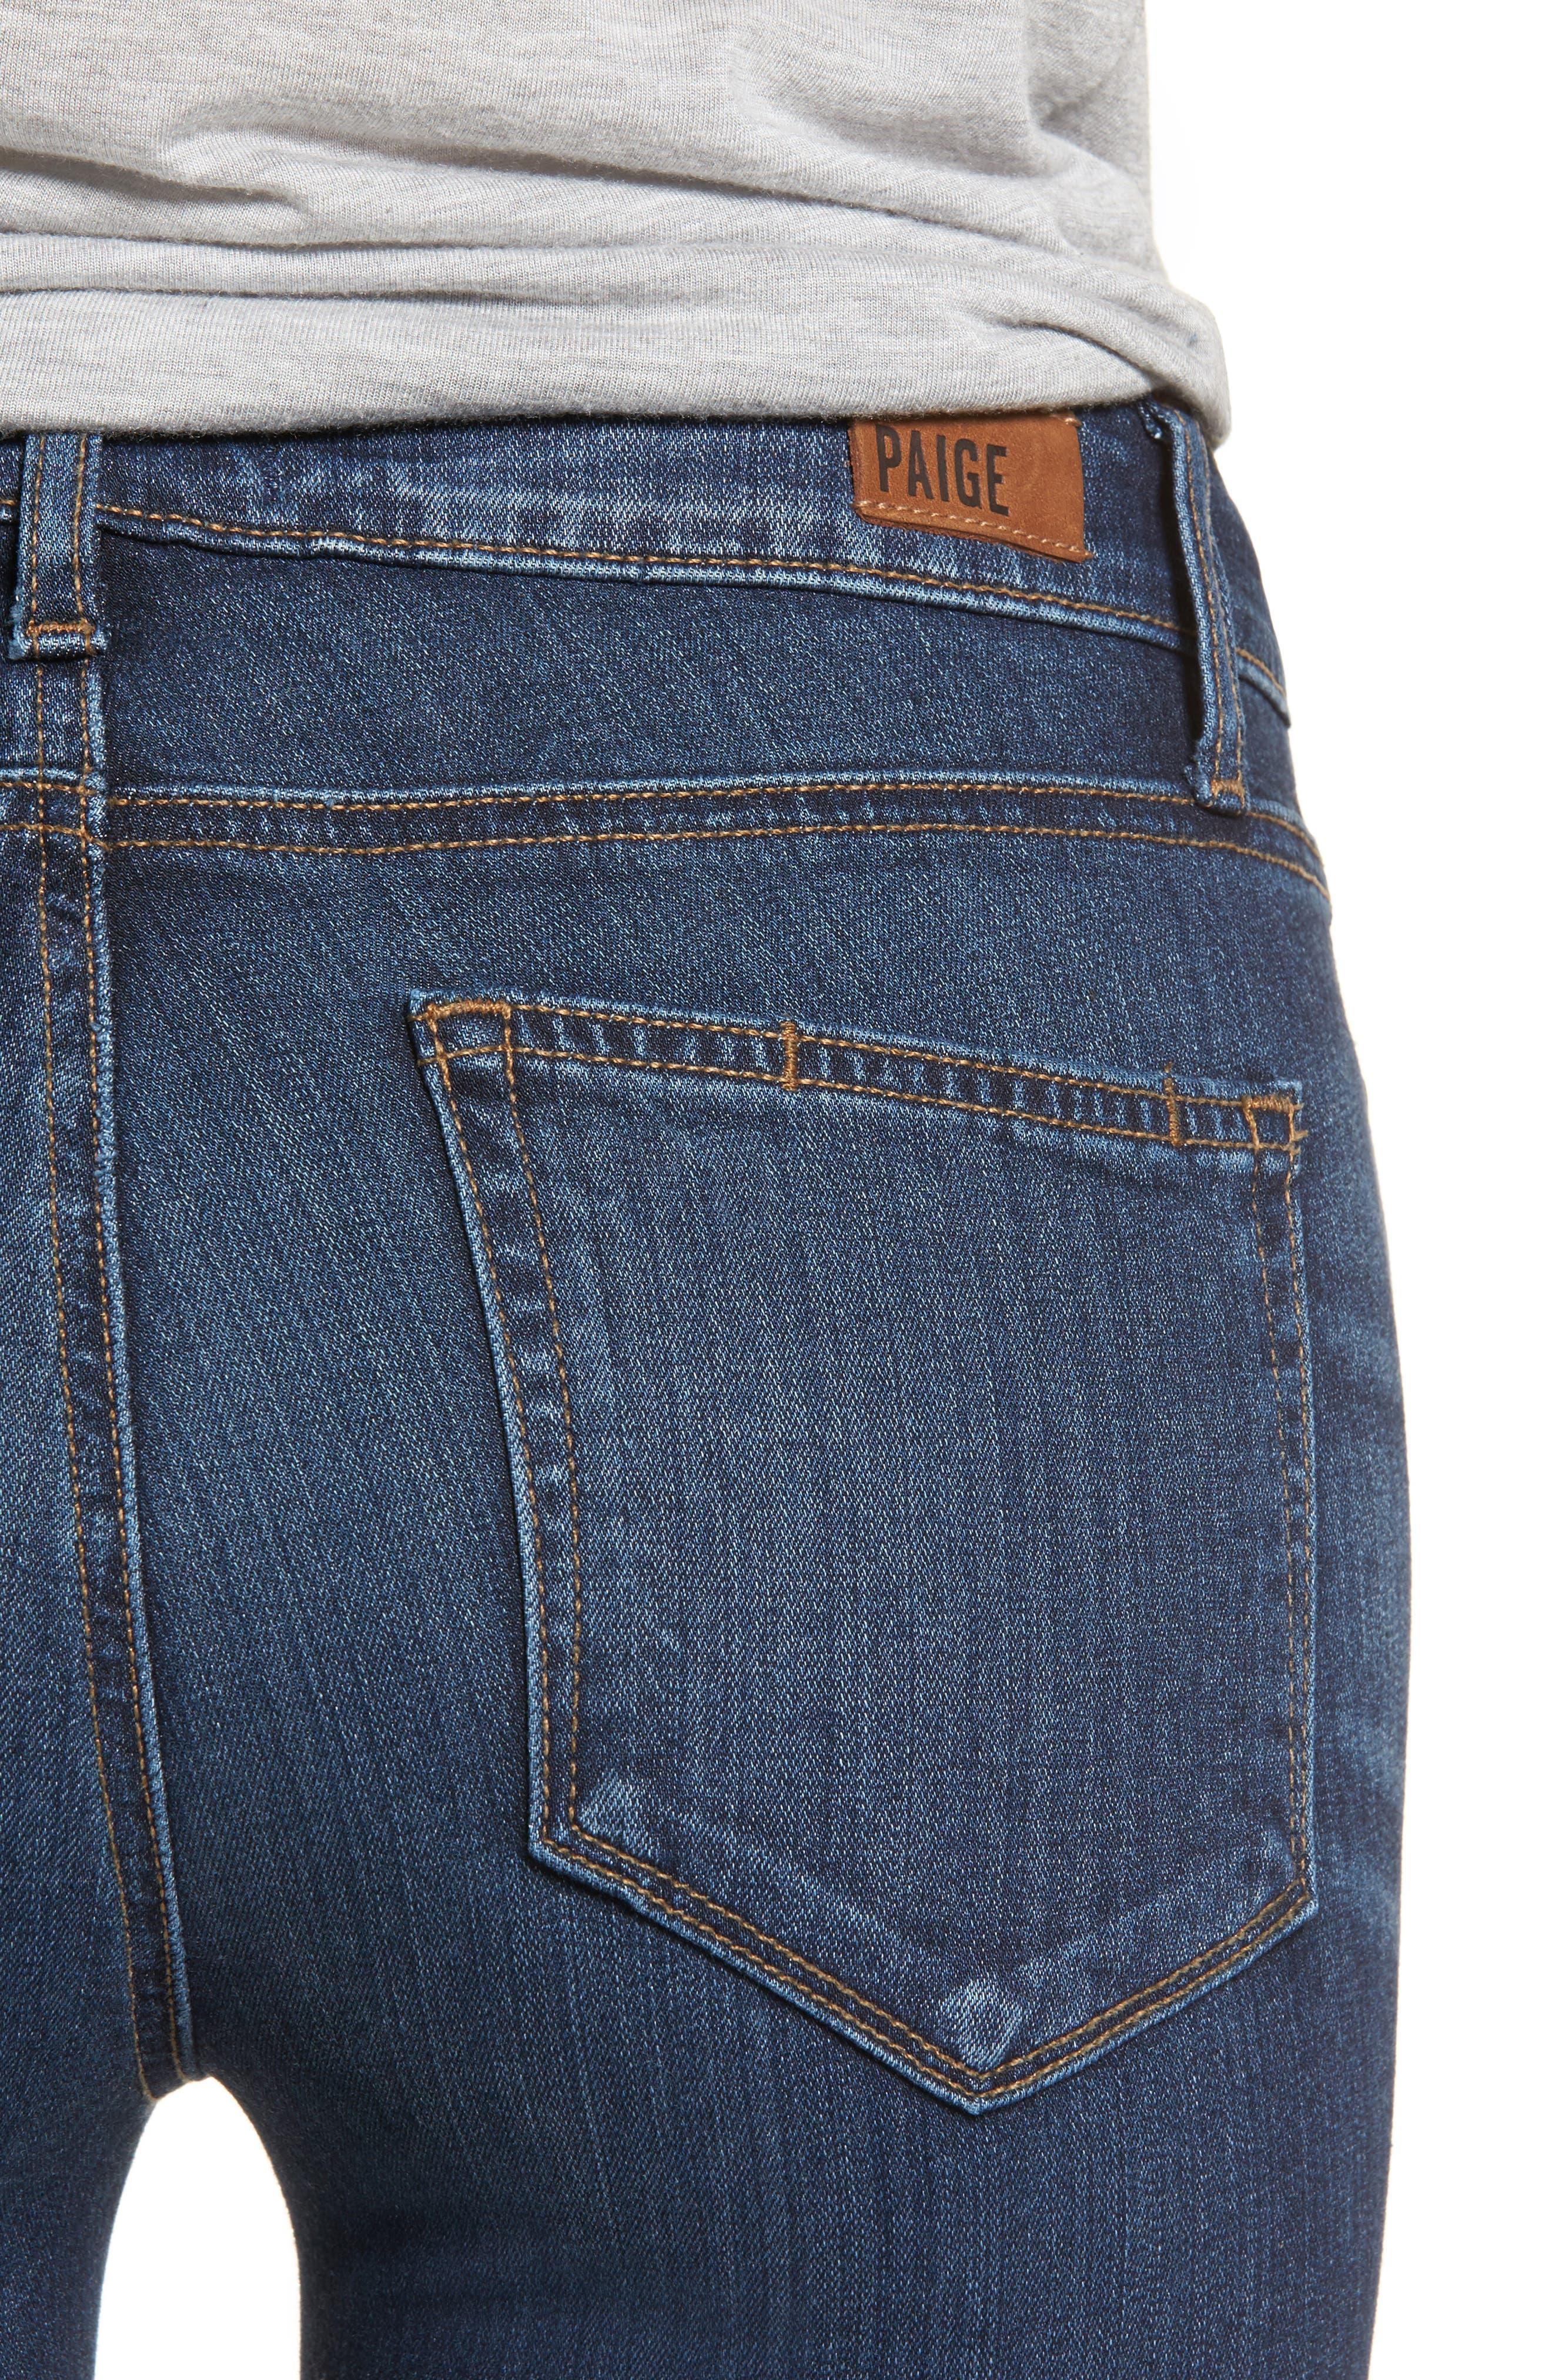 Transcend - Verdugo Ankle Ultra Skinny Jeans,                             Alternate thumbnail 4, color,                             Oaklyn